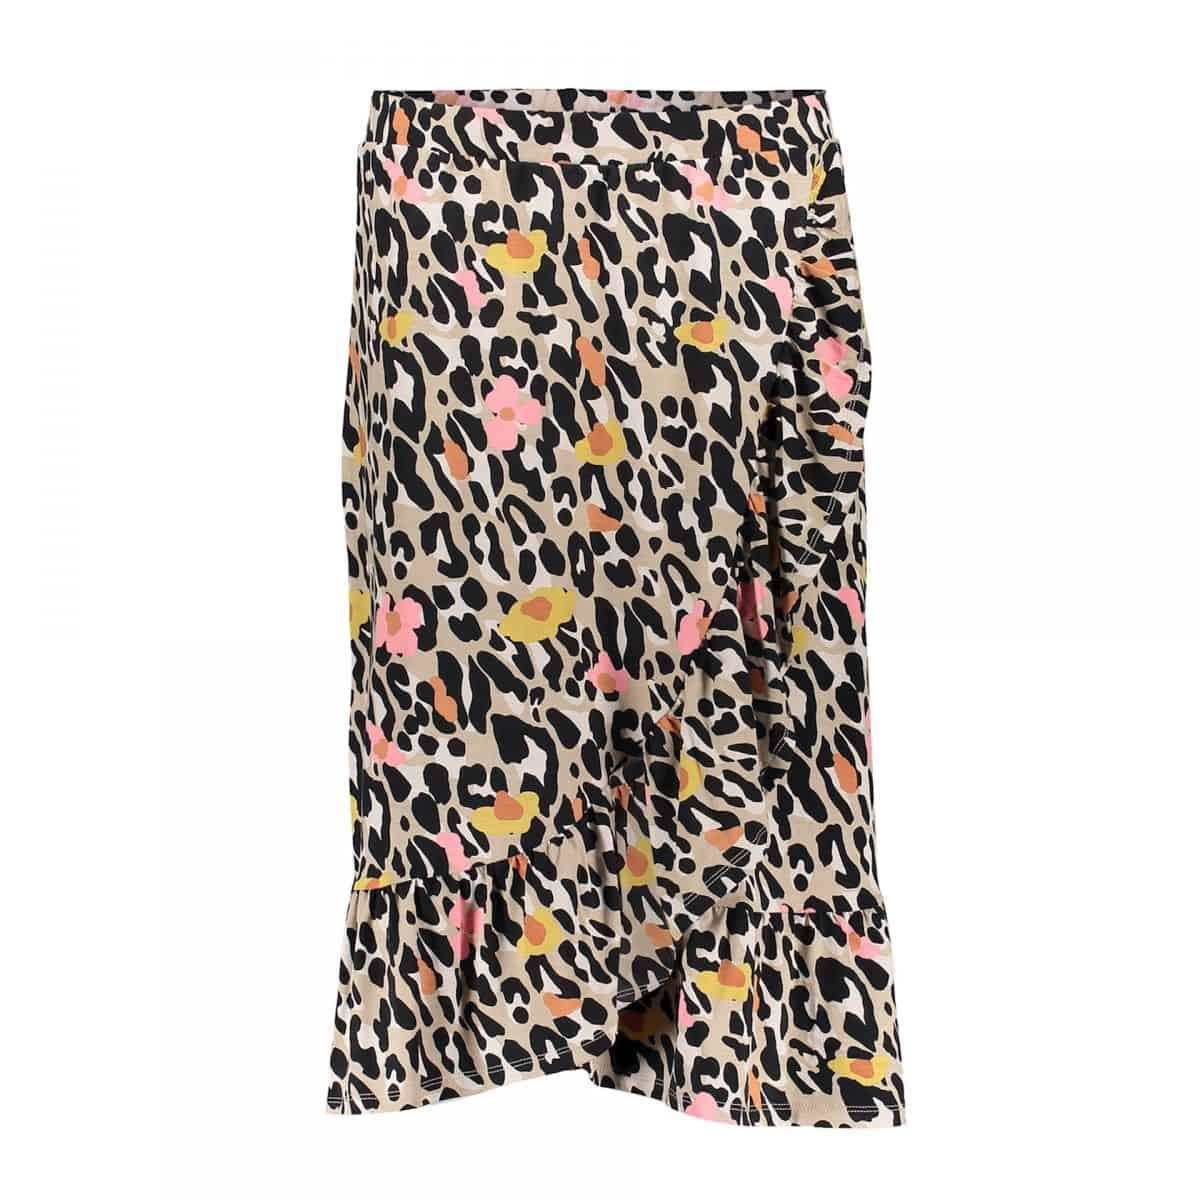 Geisha Skirt Wrap